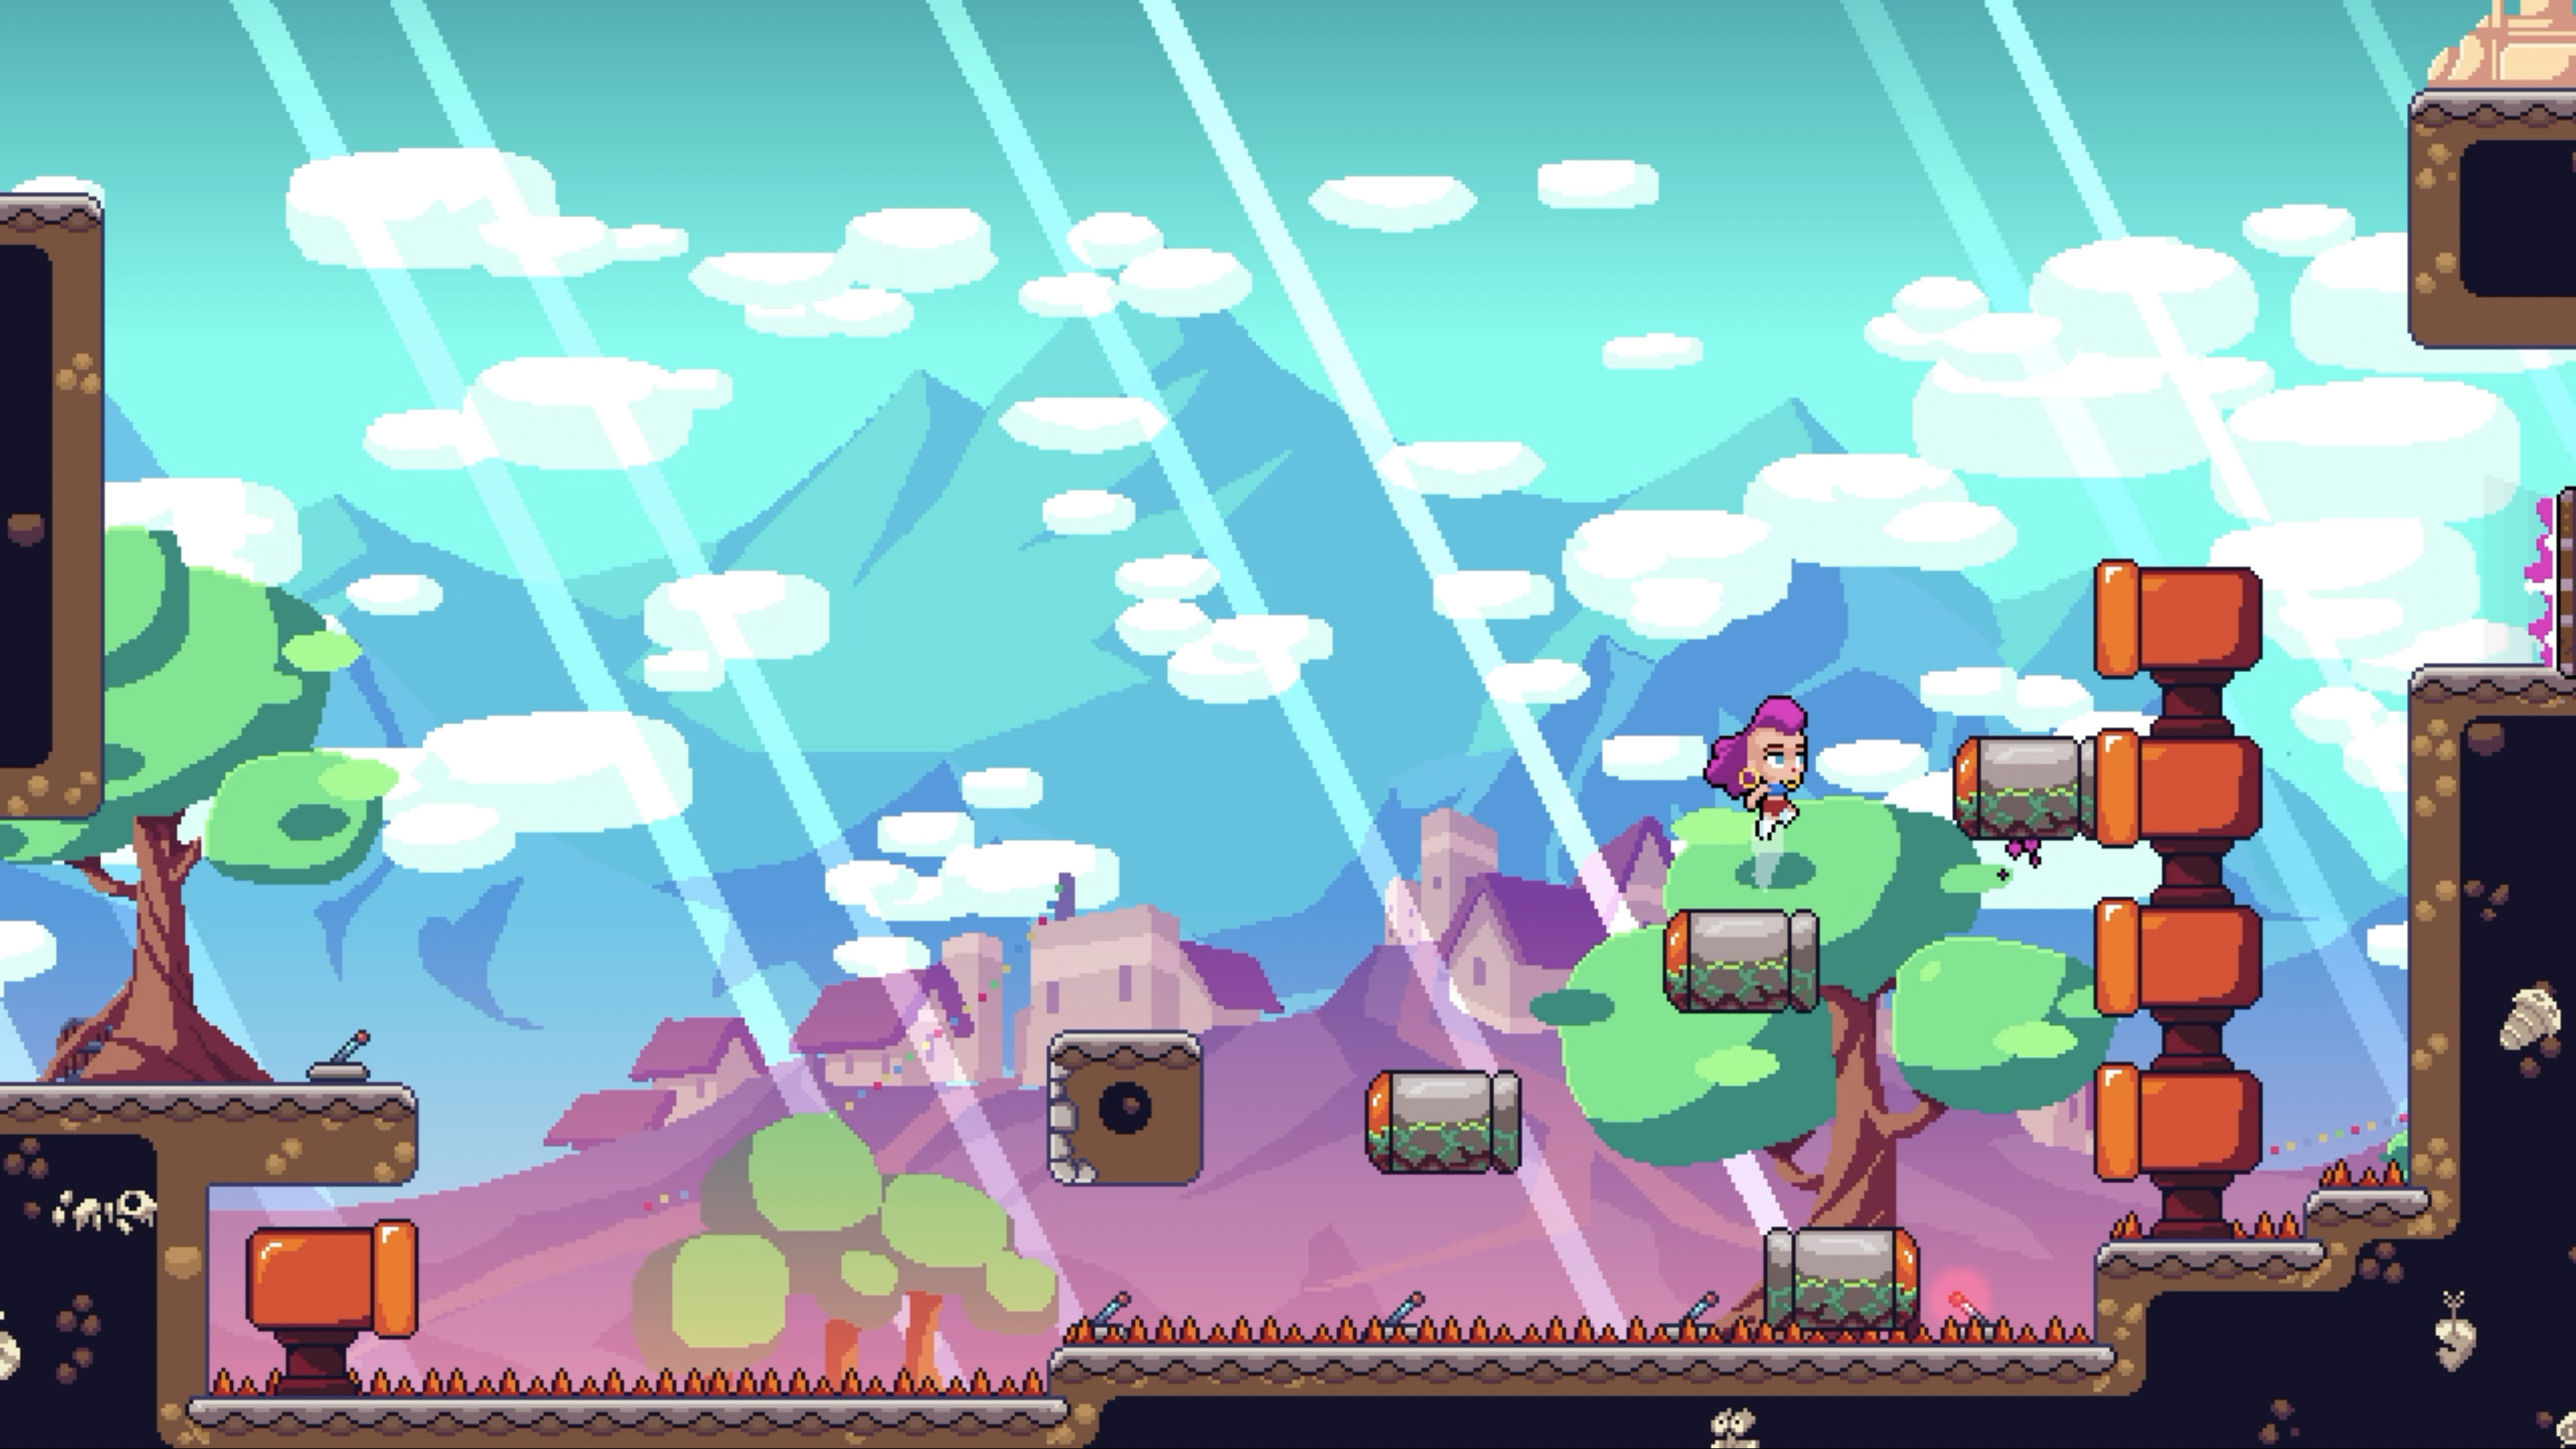 Glam screenshot